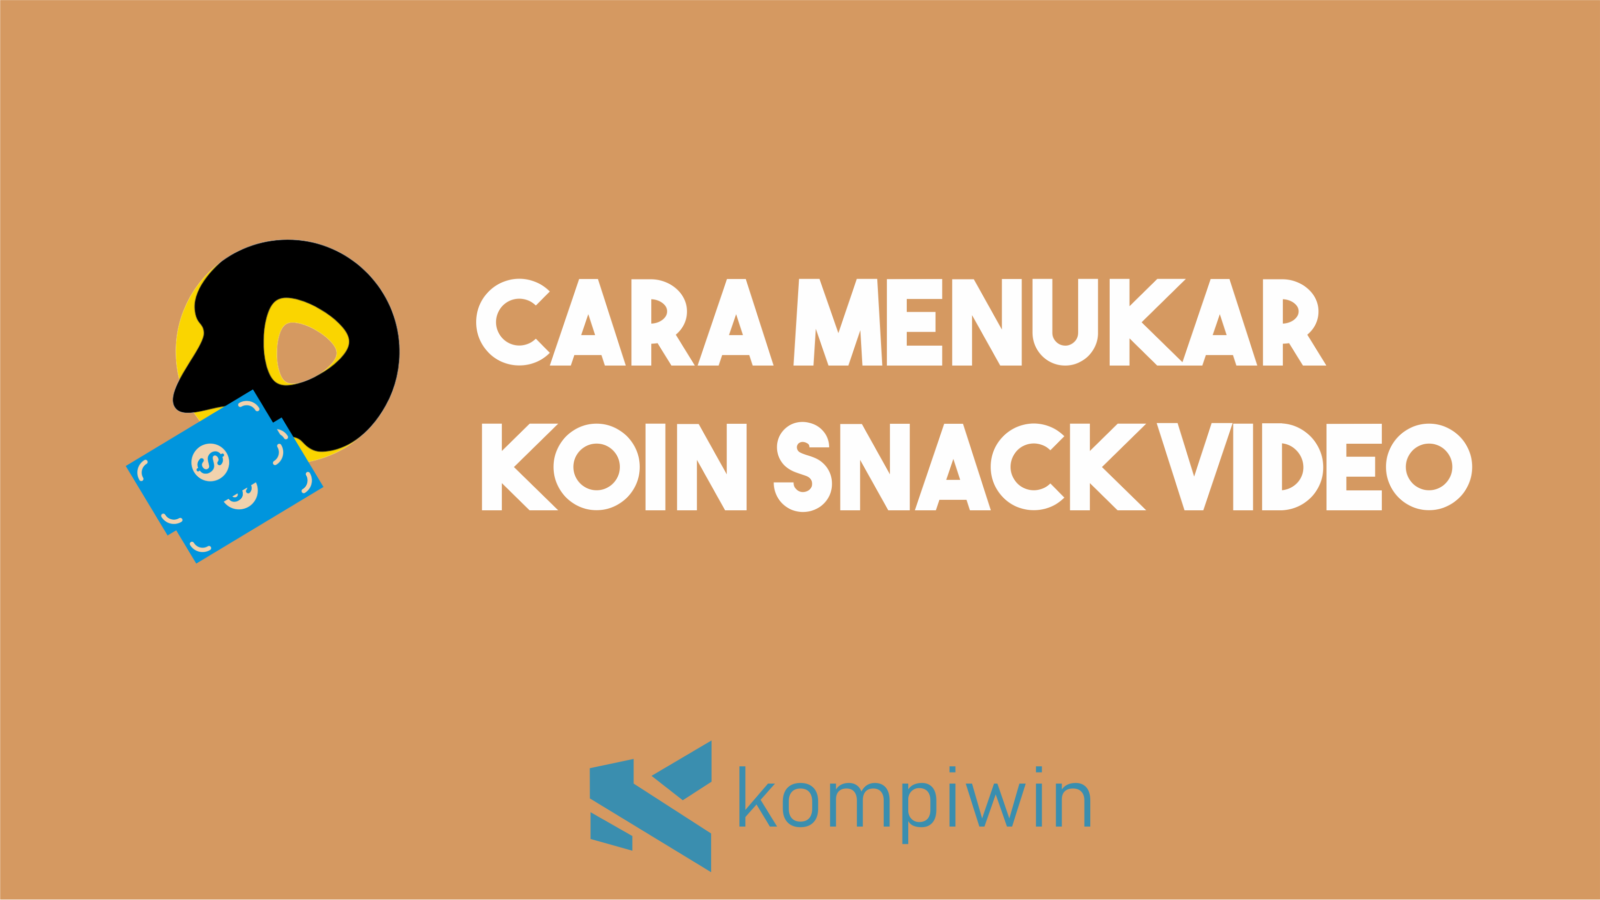 Cara Menukar Koin Snack Video 4